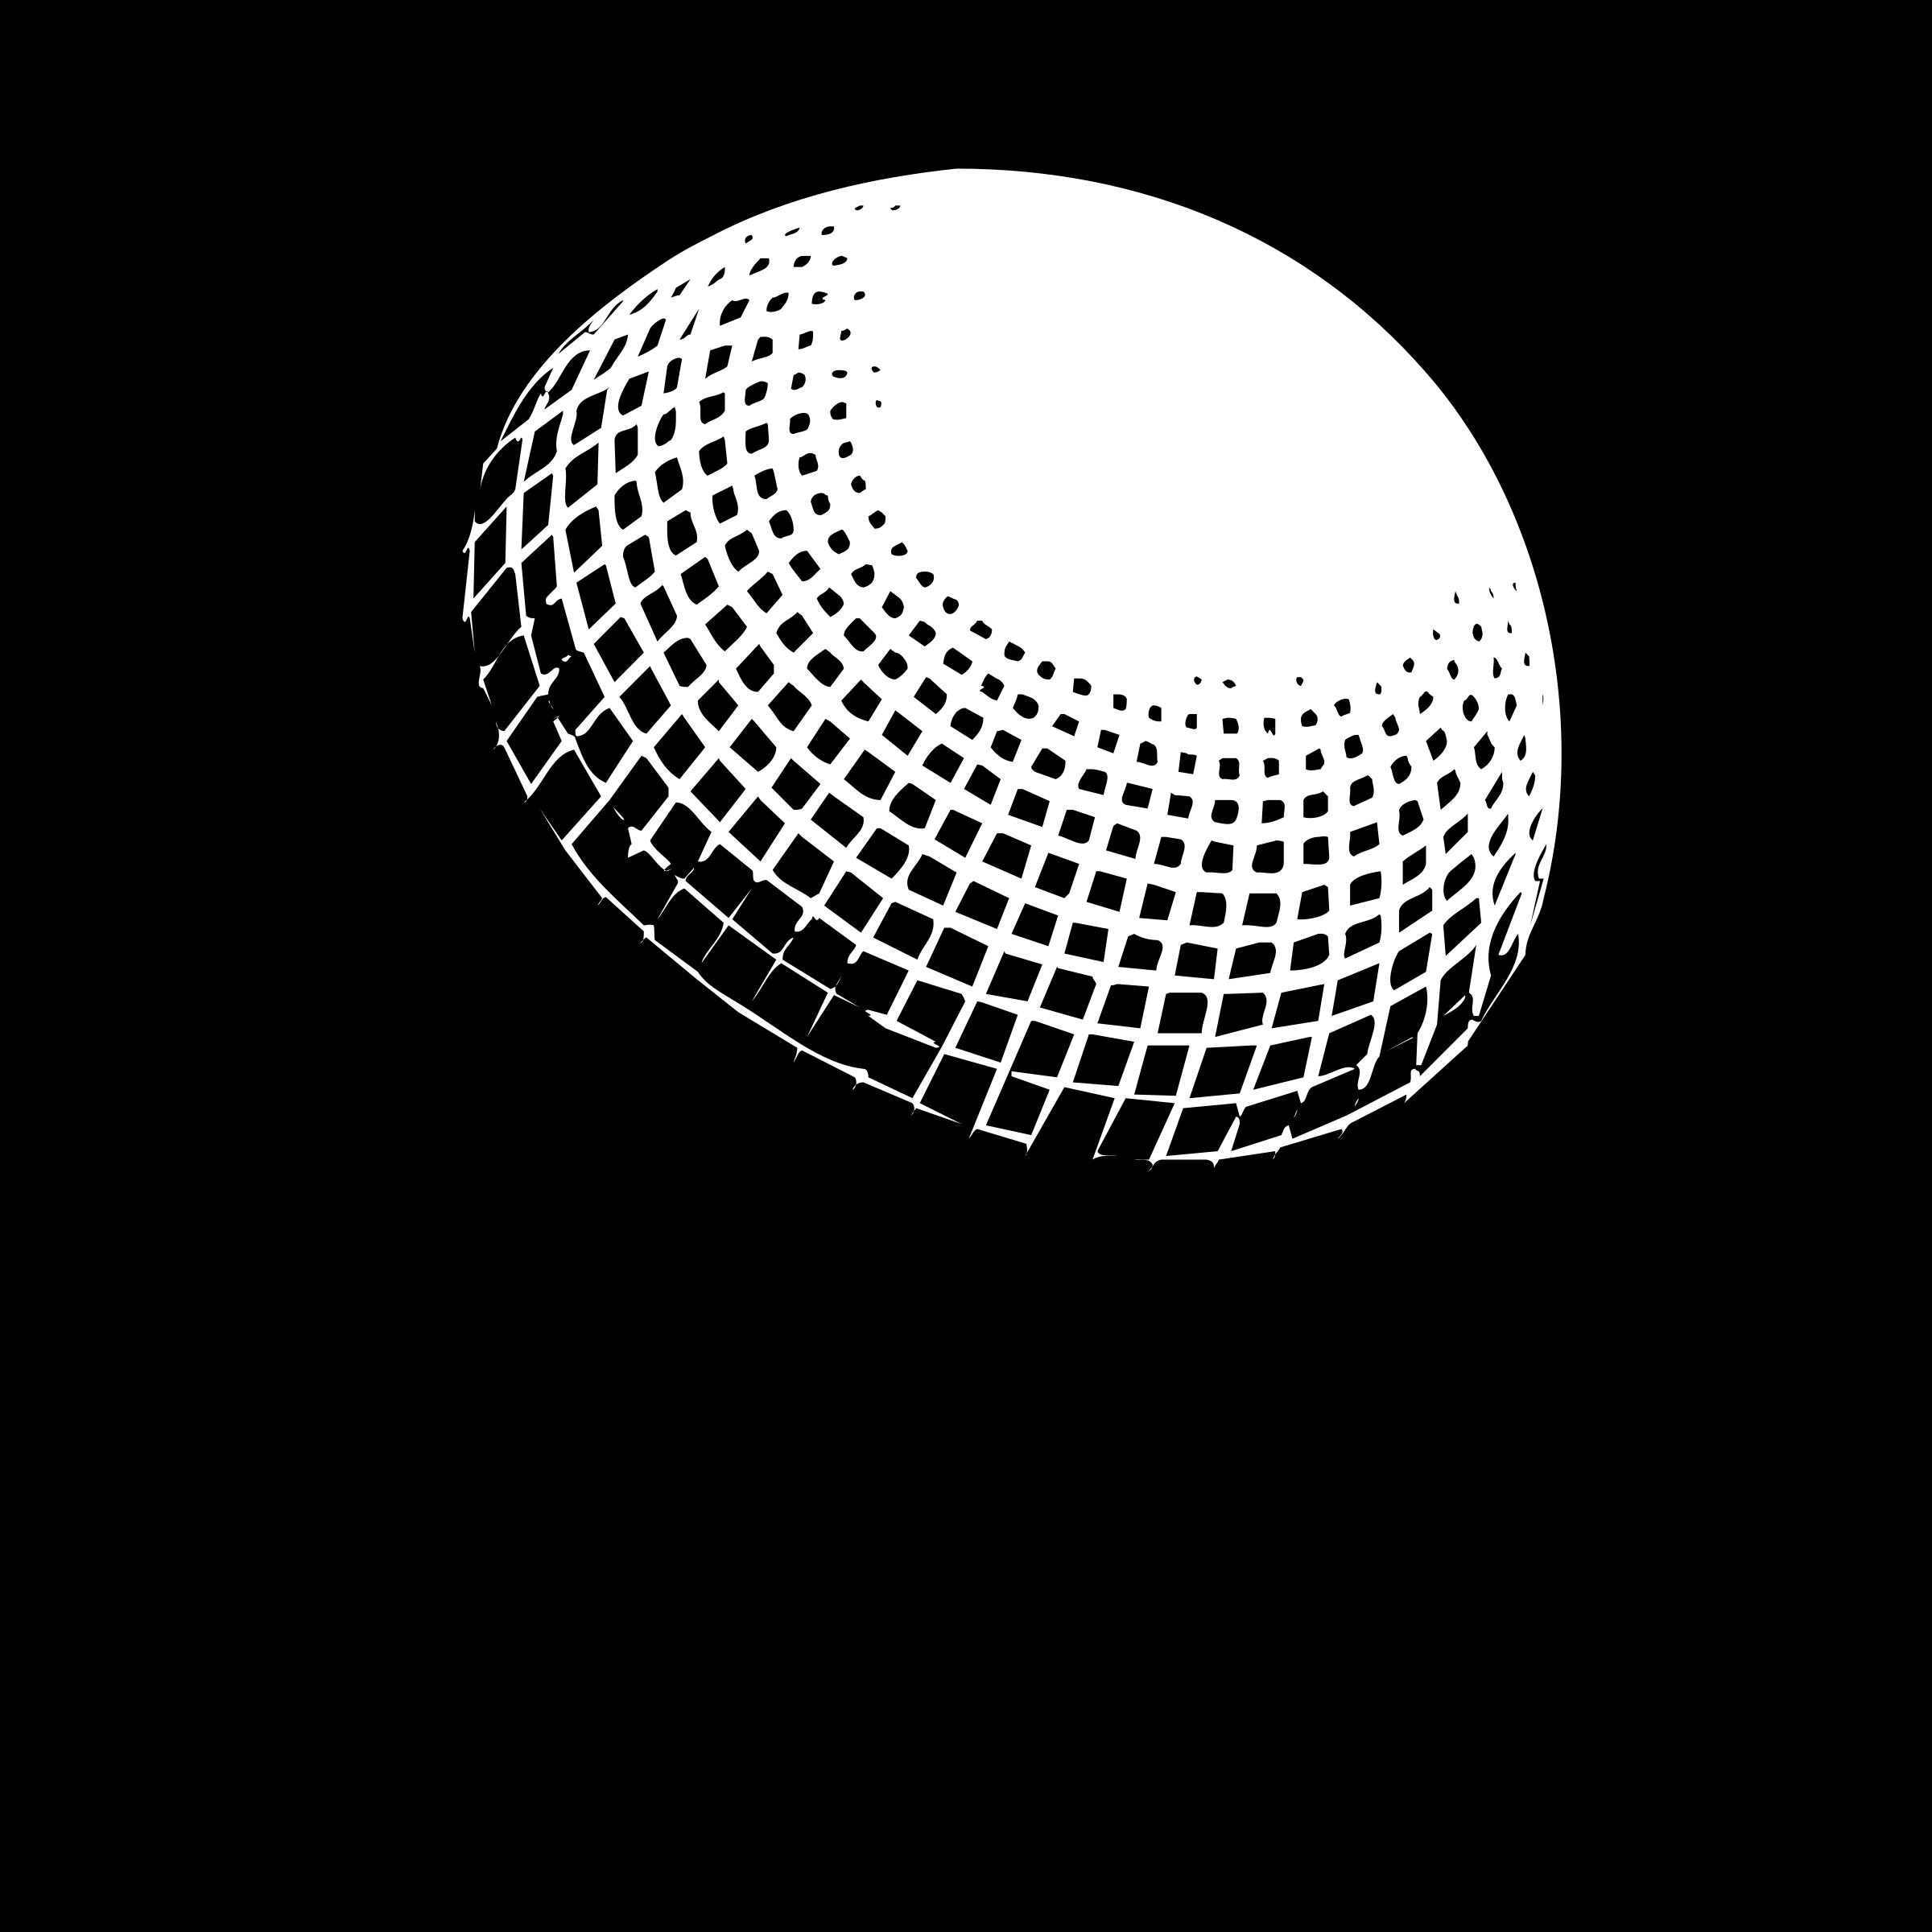 image black and white Amadeus global travel logo. Vector distribution